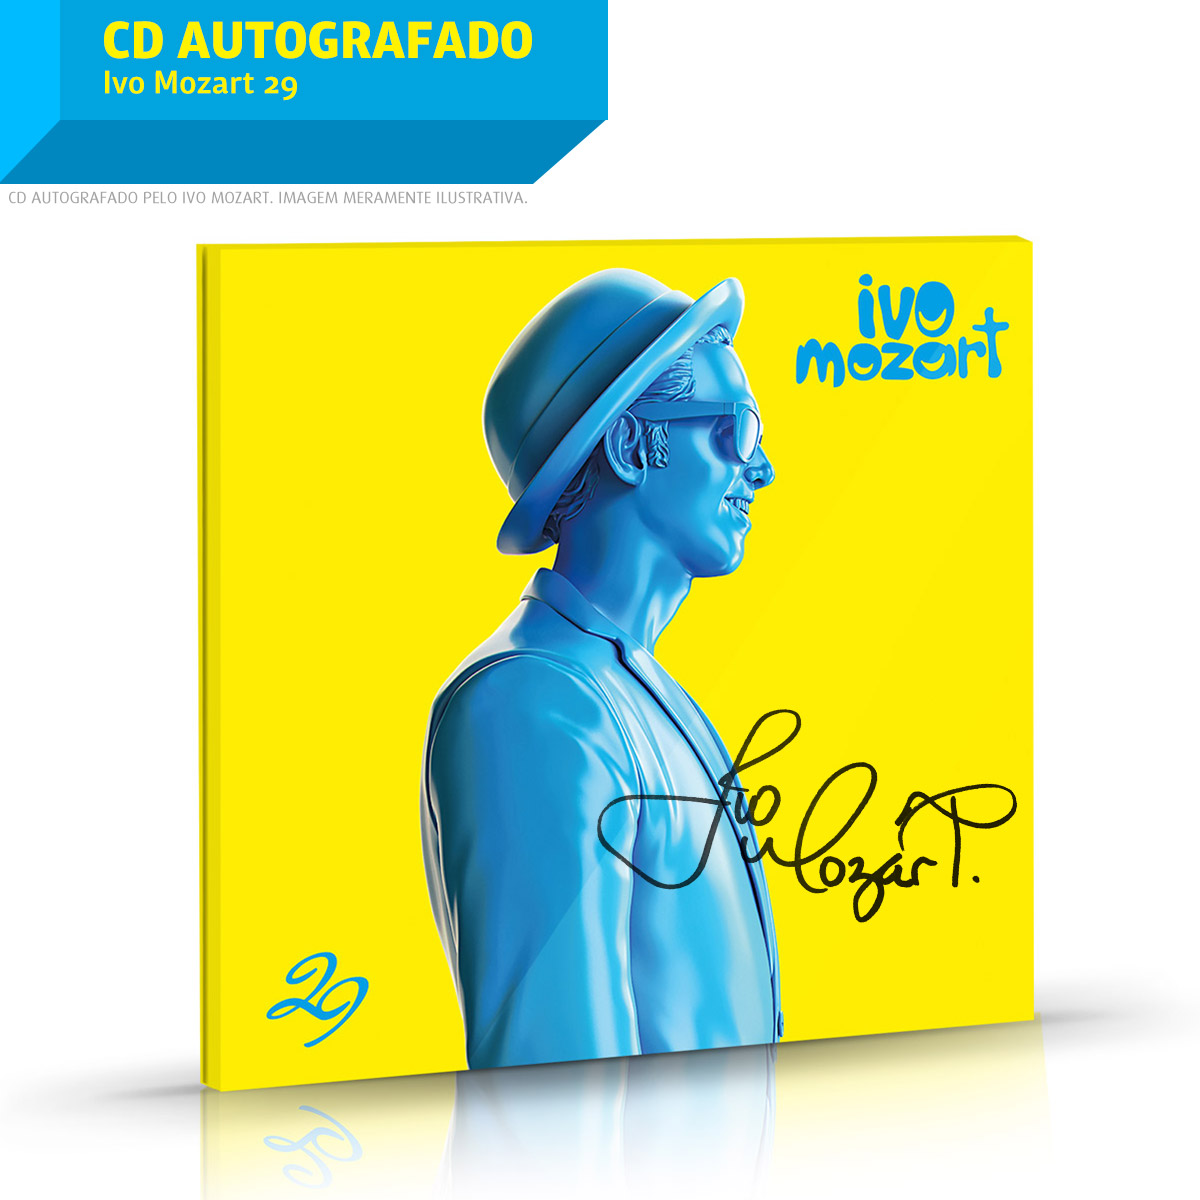 Combo Ivo Mozart CD 29 AUTOGRAFADO + Pôster